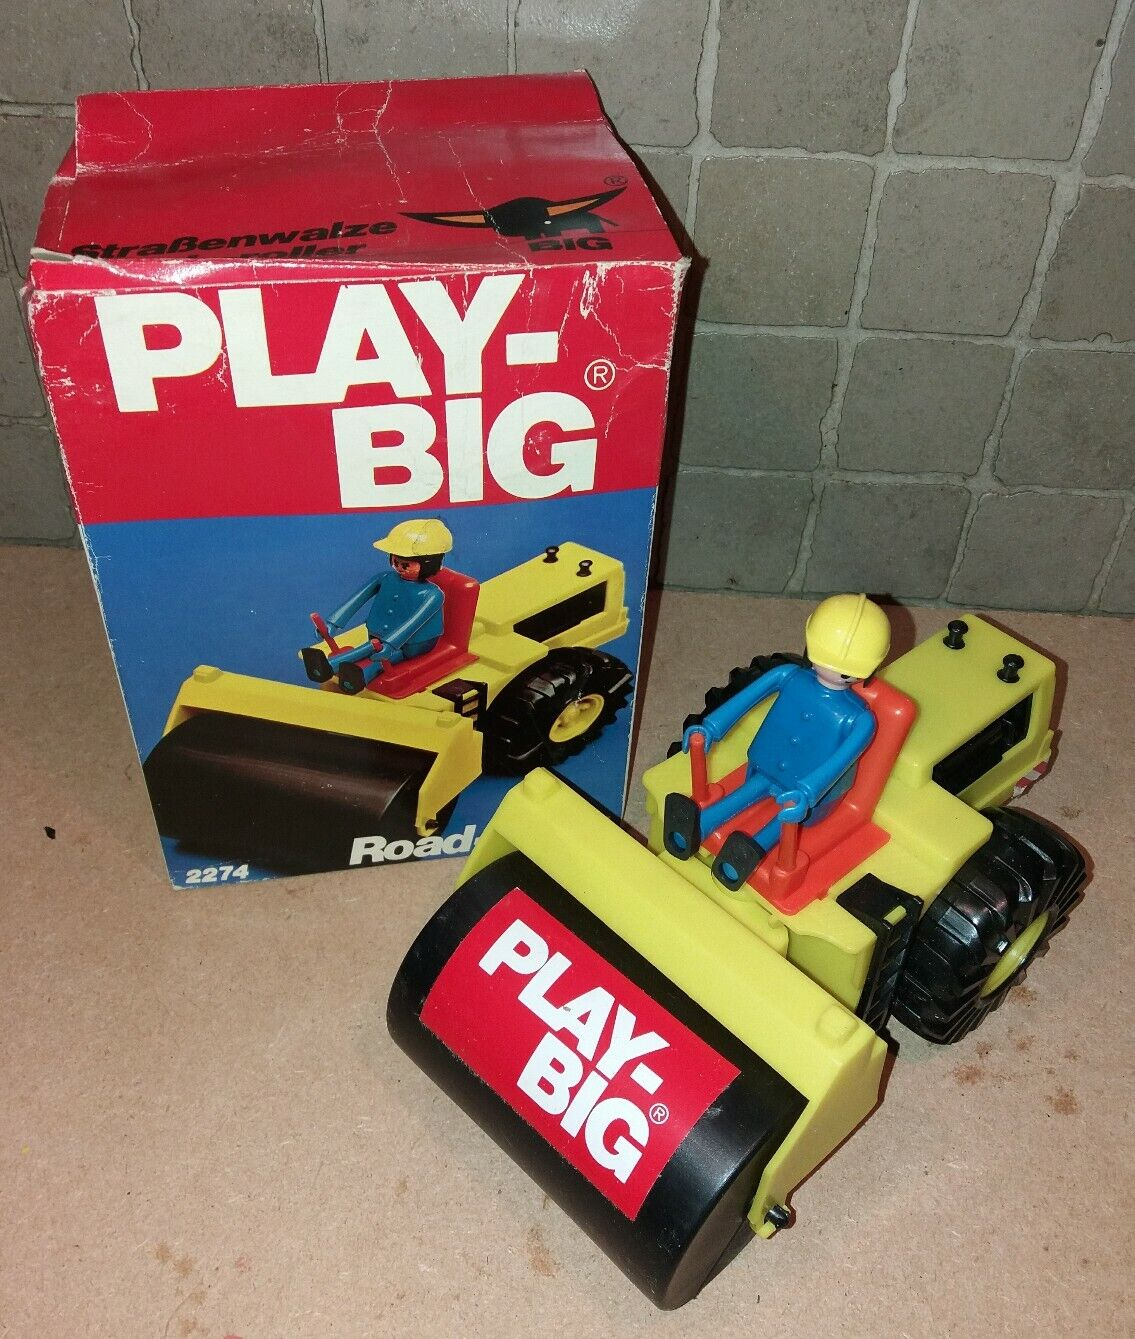 Playbig 2274   engin de chantier, rouleau.